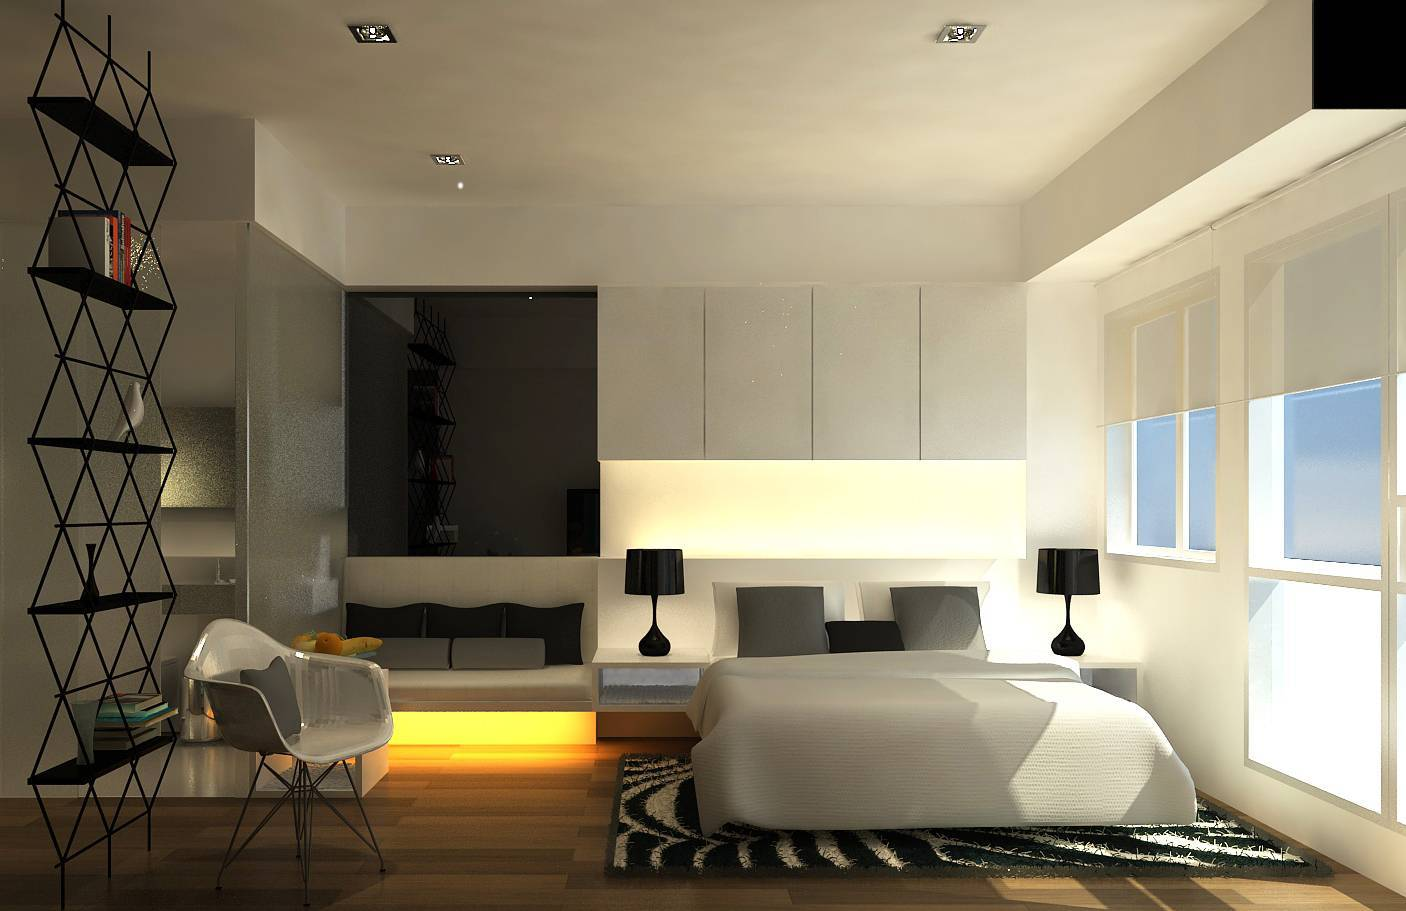 Ruang Komunal Kemang Studio Apartment Kemang Village Apartment Kemang Village Apartment Bedroom Area Modern Open Bedroom Area 6544